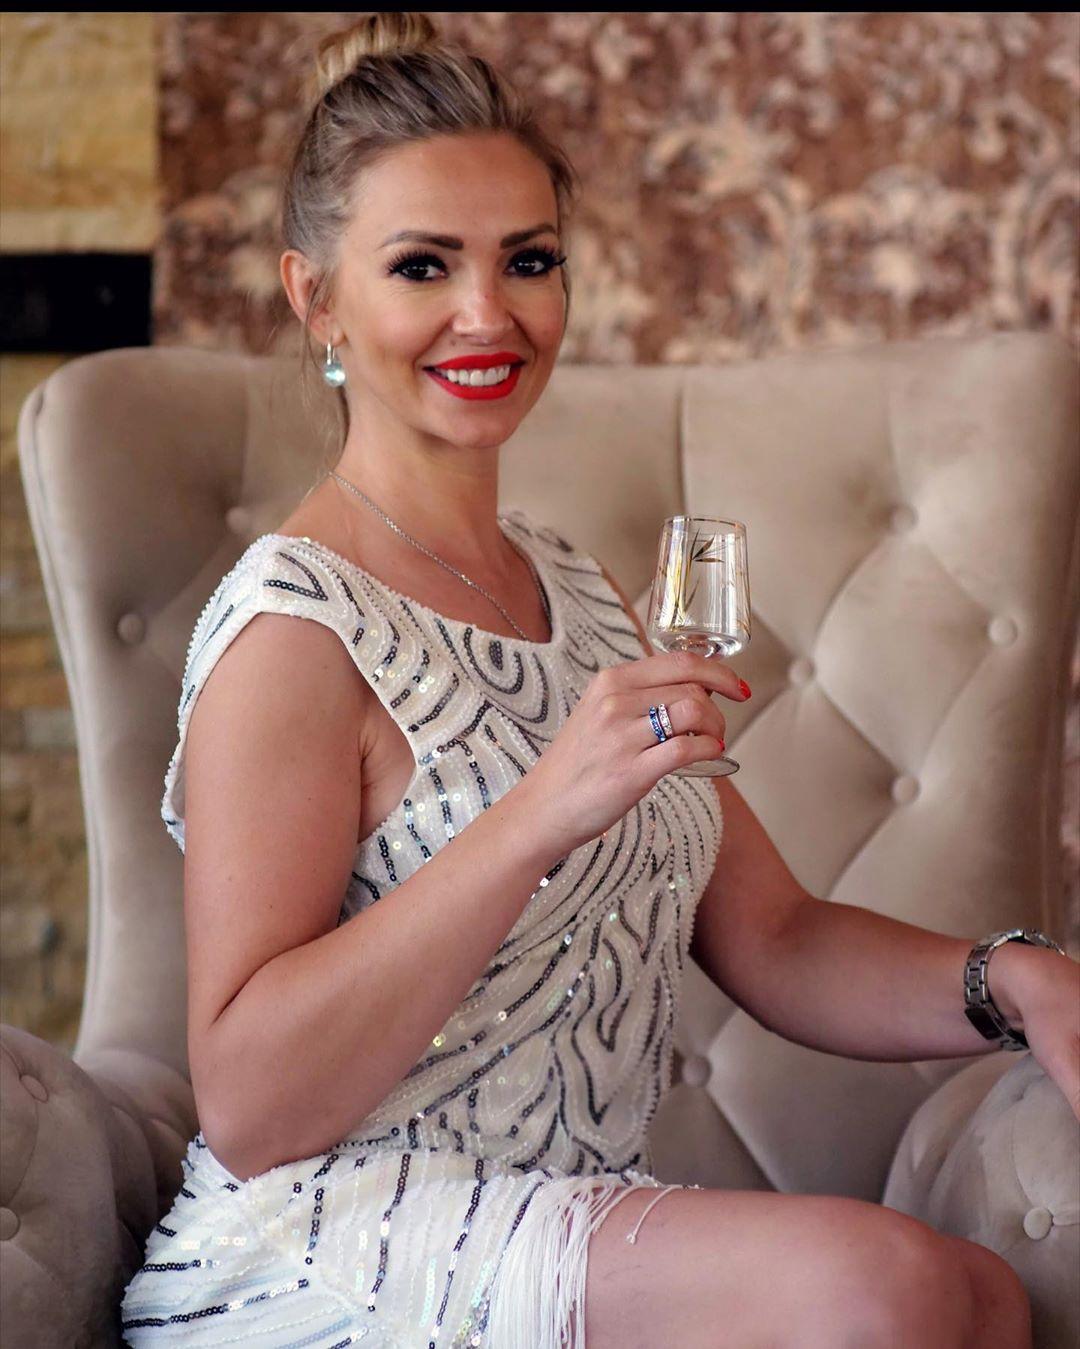 BLISTA NAKON RAZVODA: Jelena Gerbec ljepša nego ikad - Express